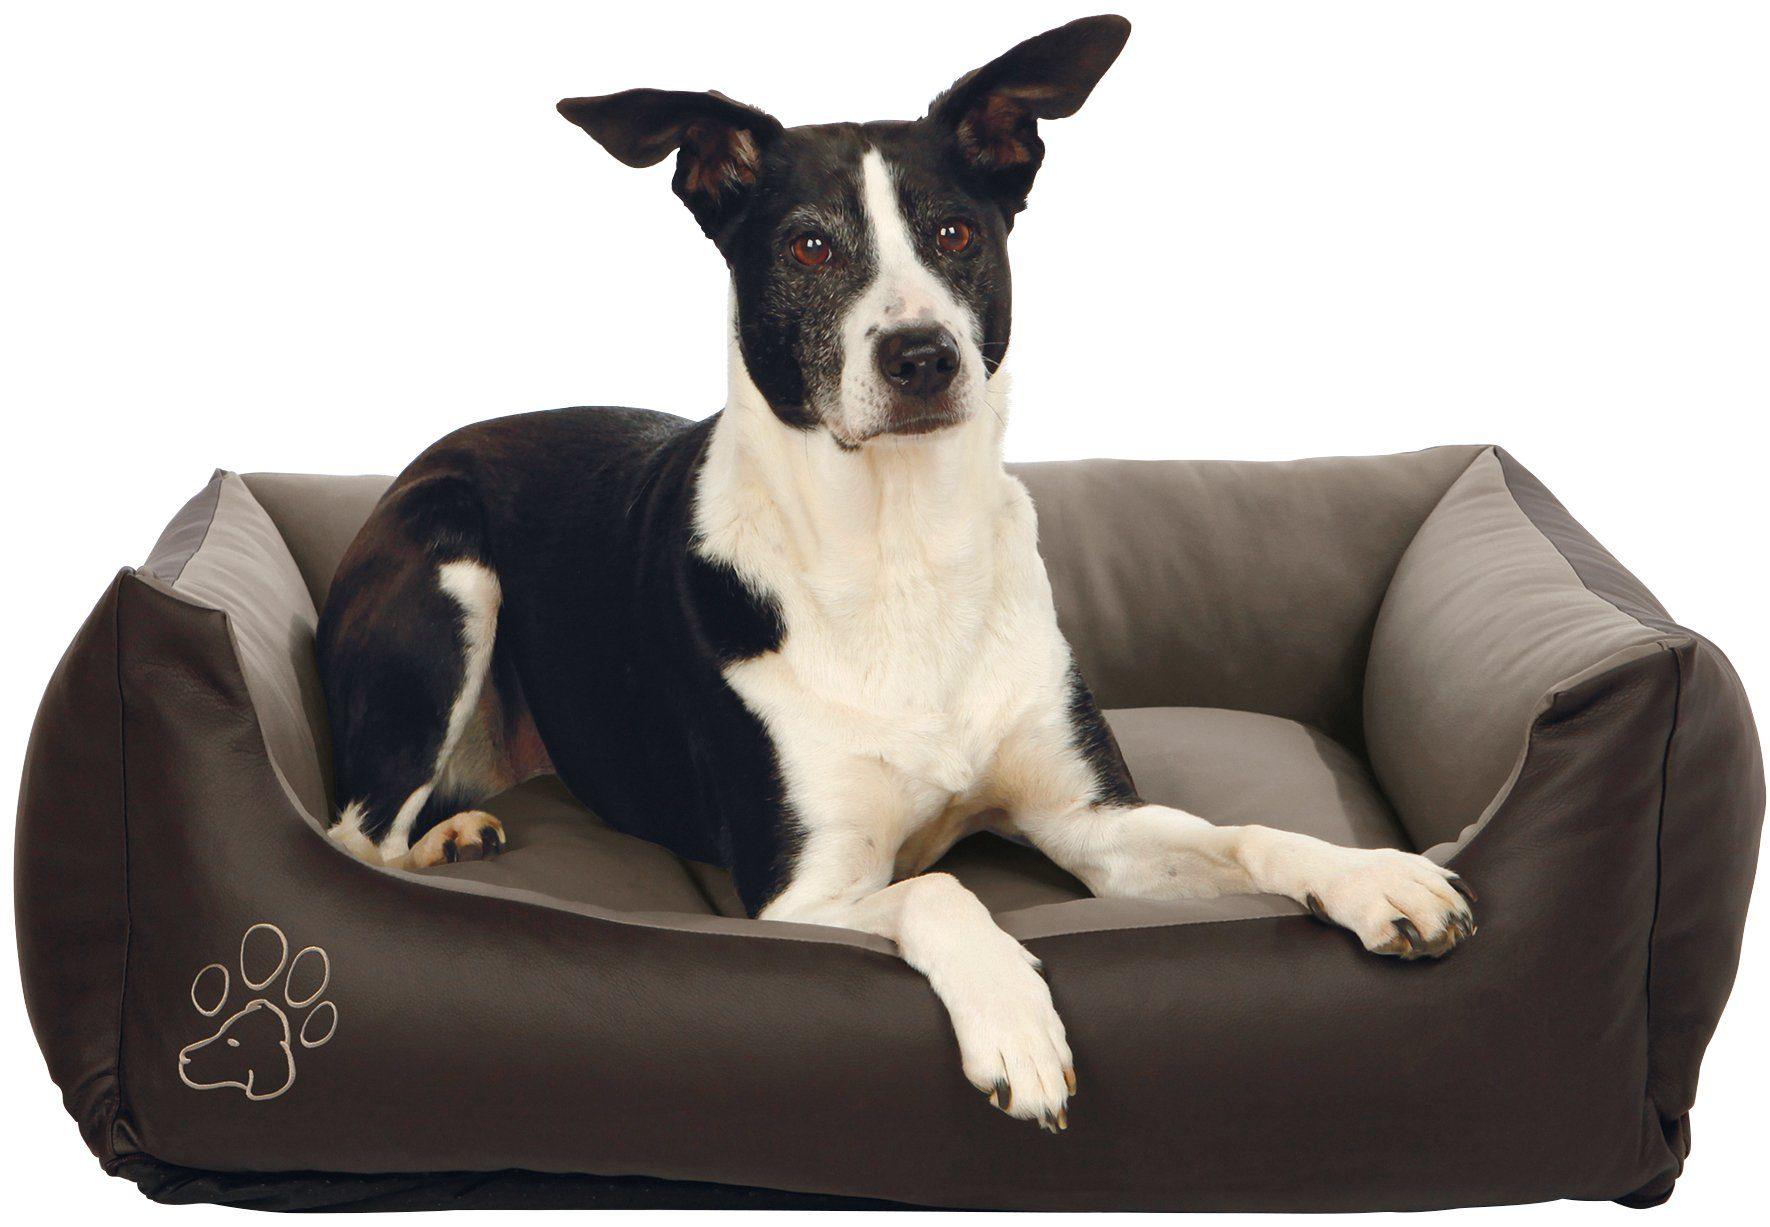 TRIXIE Hundebett »Bino«, BxL: 60x40 cm, dunkelgrau/taupe